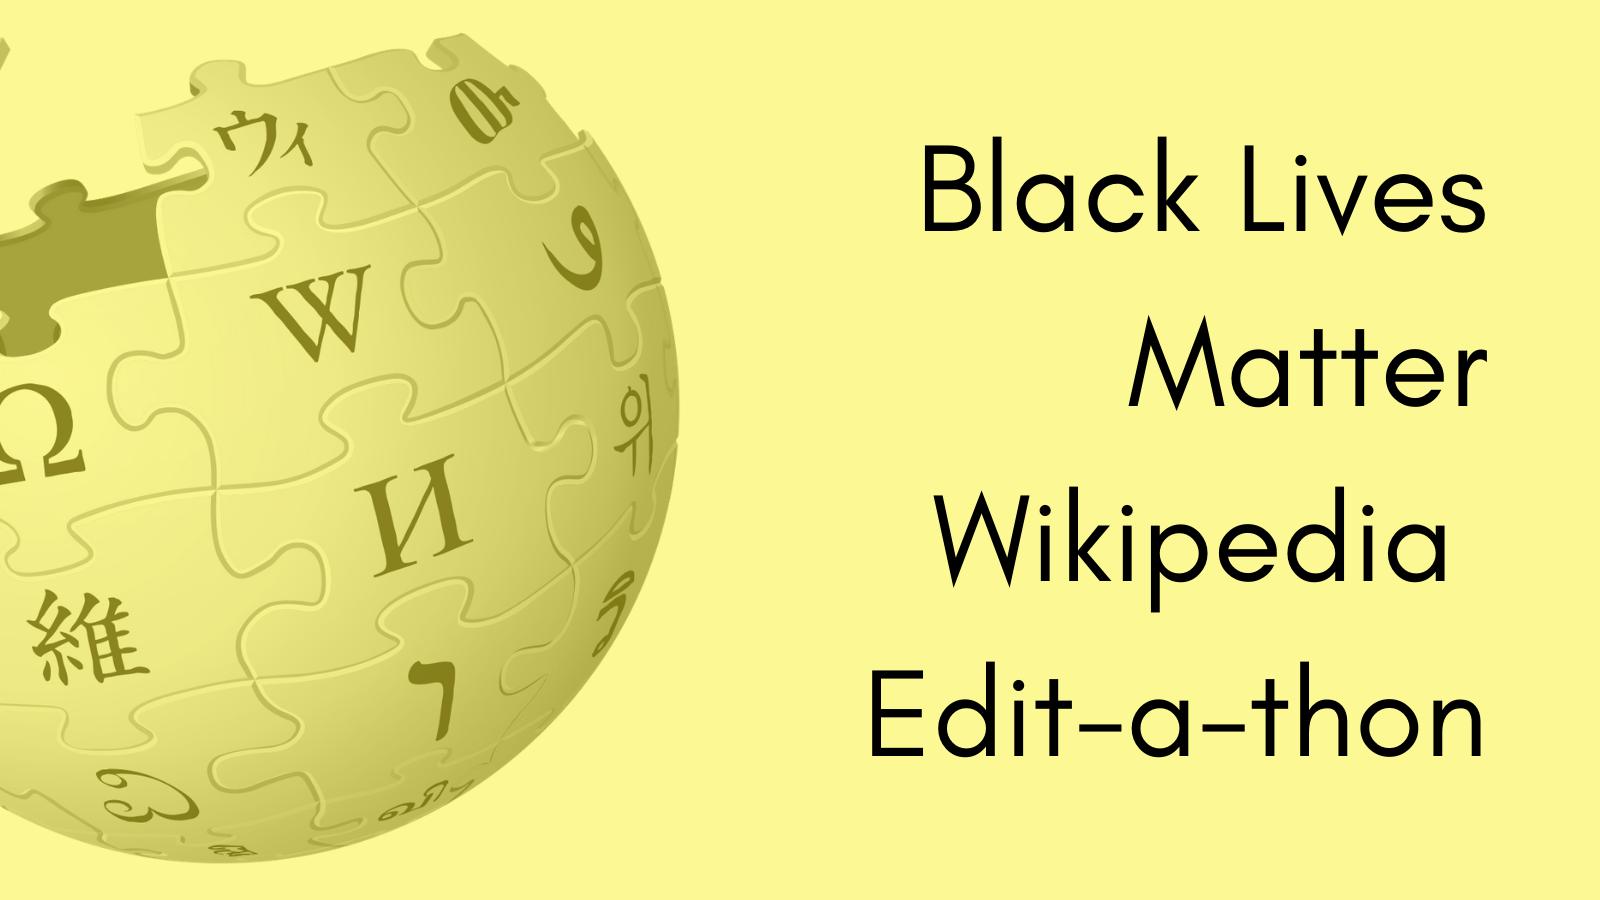 Black Lives Matter Wikipedia Edit-a-thon